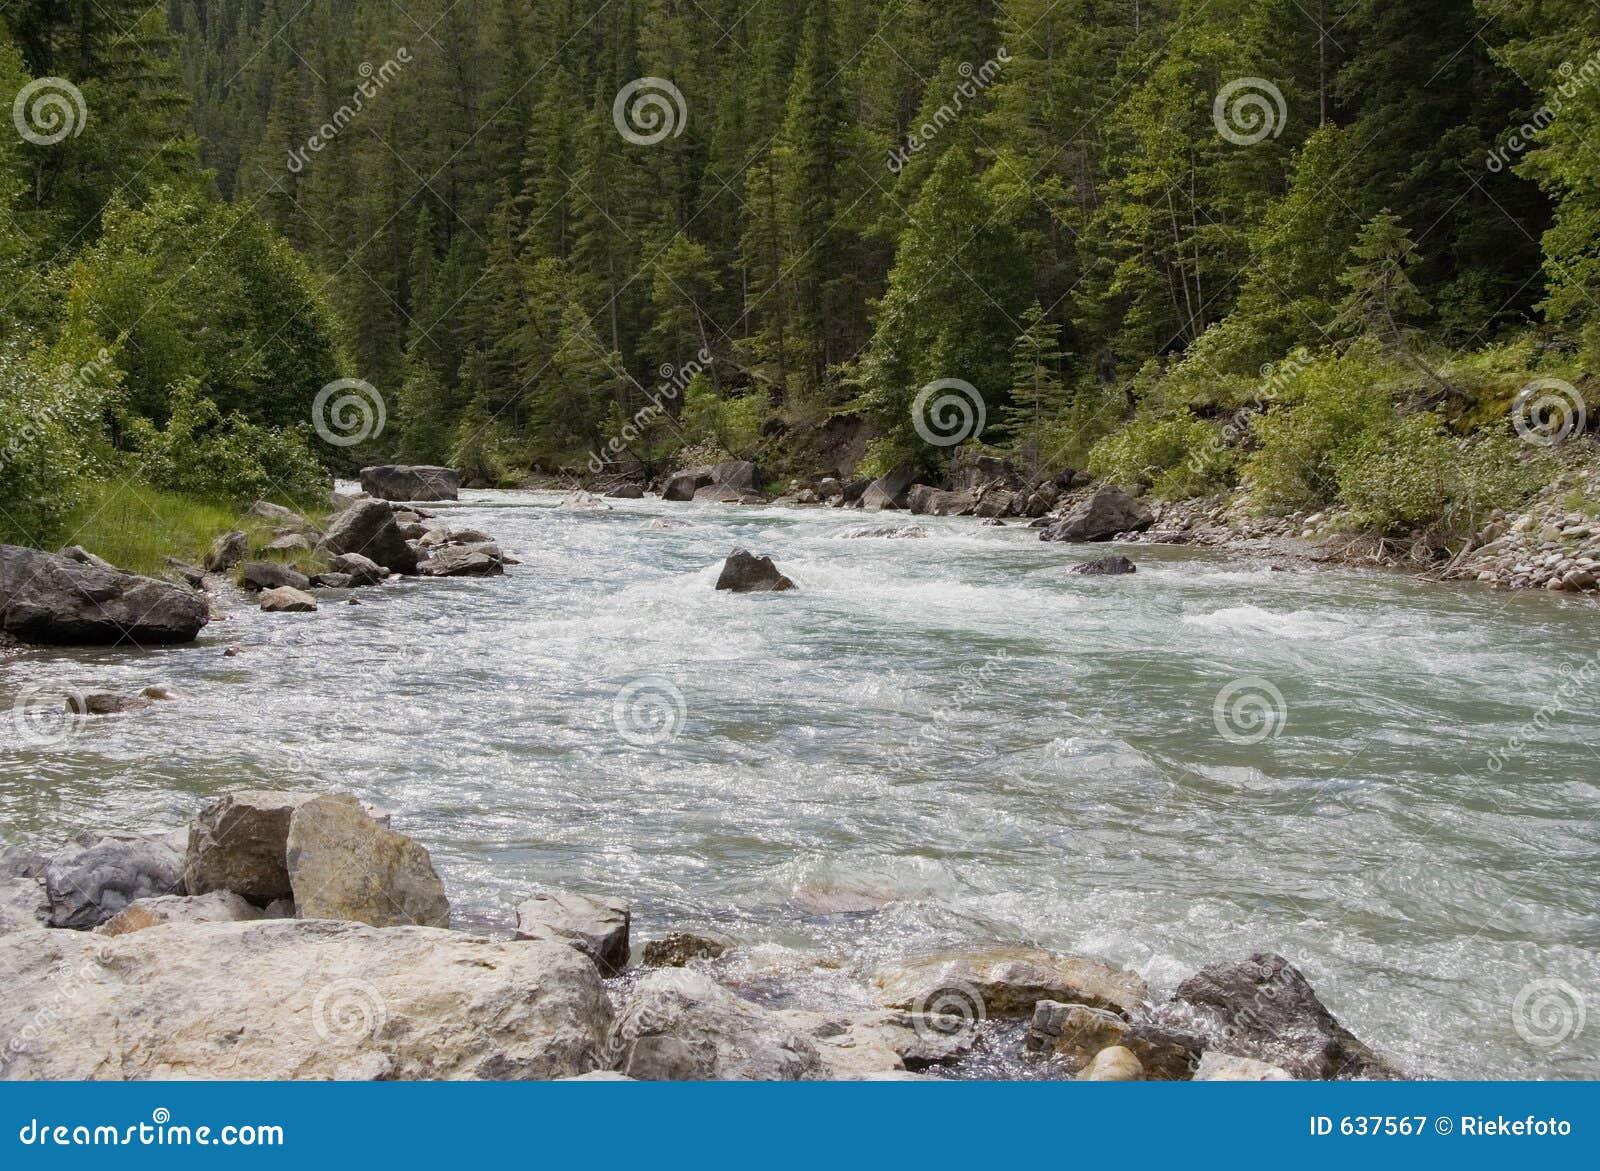 Download более Lussier река гор утесистое Стоковое Изображение - изображение насчитывающей запас, brooches: 637567